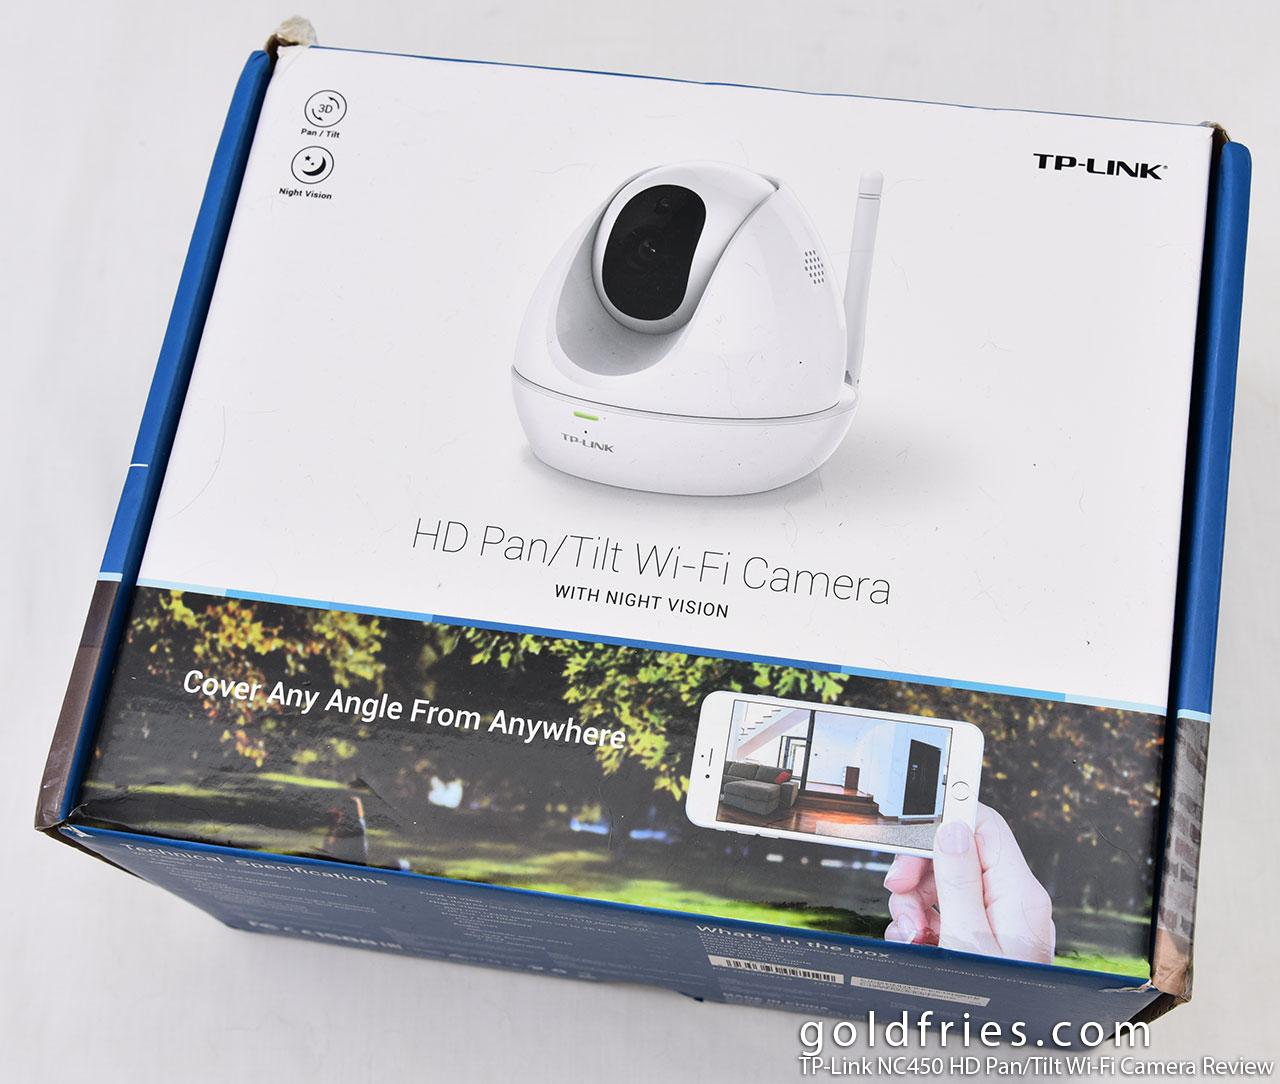 TP-Link NC450 HD Pan/Tilt Wi-Fi Camera Review ~ goldfries